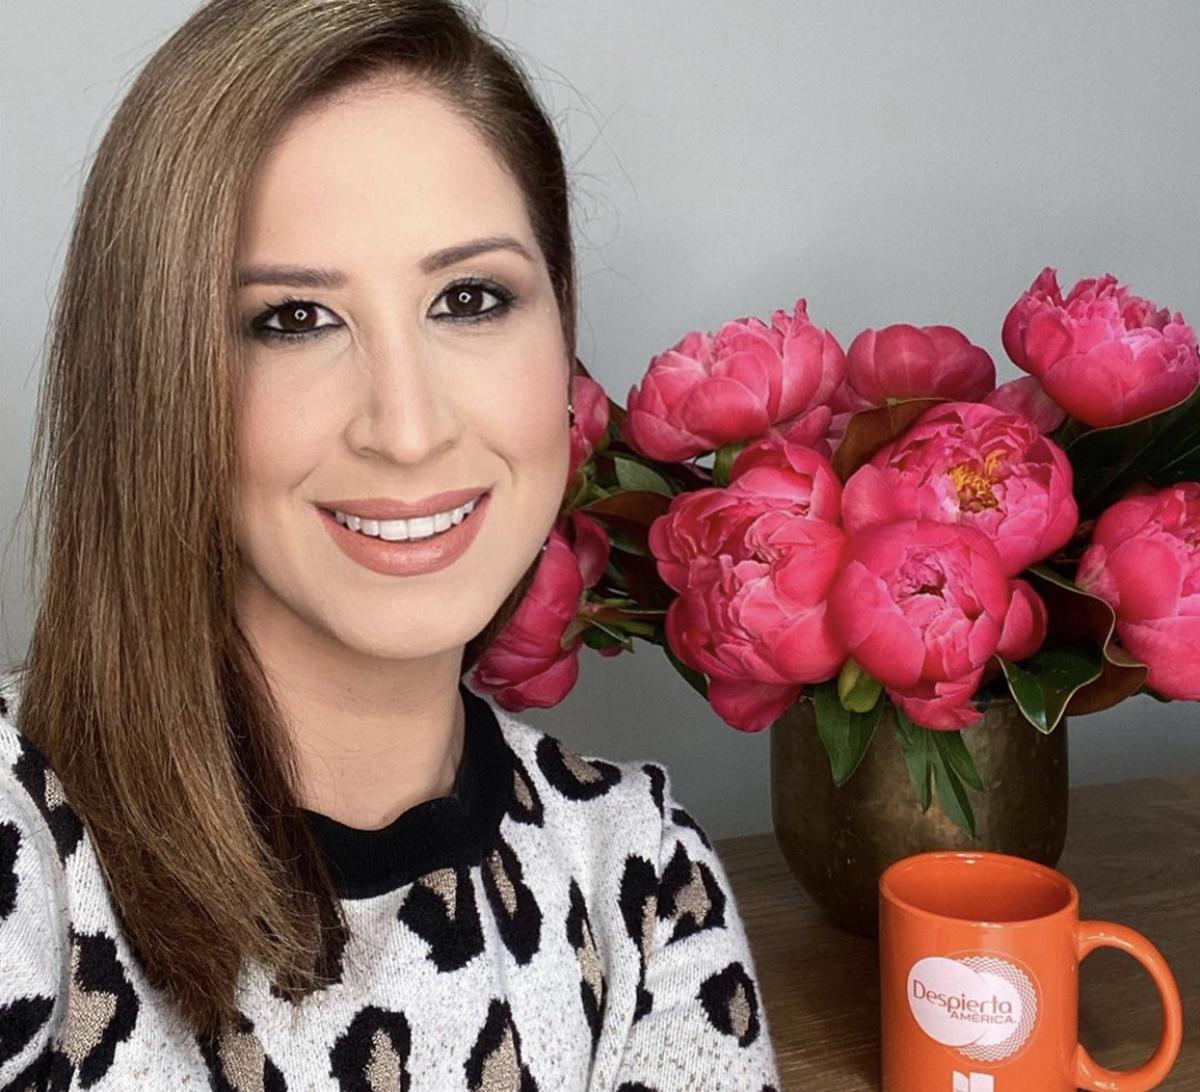 Elyangélica González de 'Despierta América' operada de emergencia